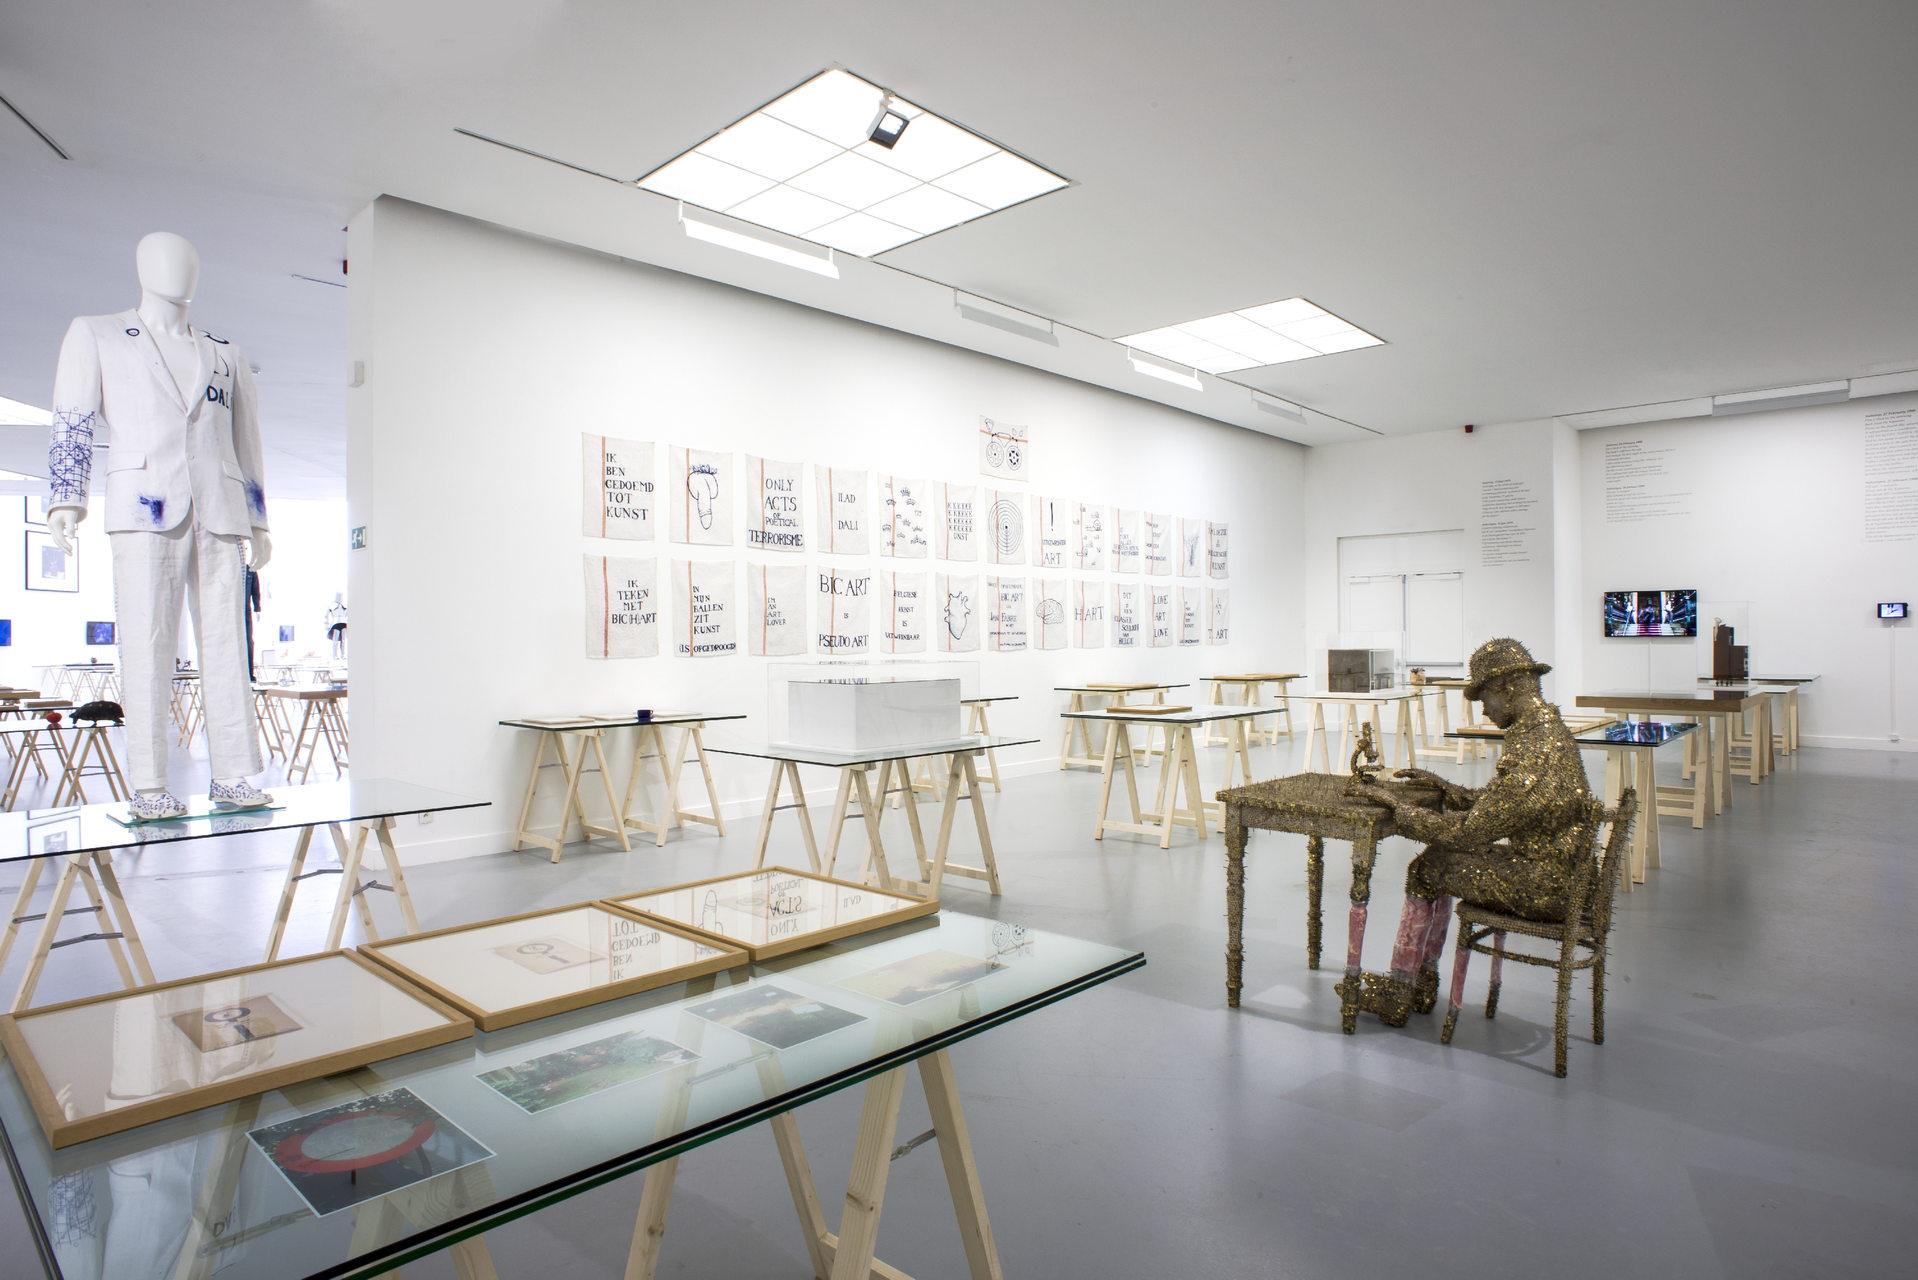 Jan_Fabre,_exhibition_view_M_HKA_2015_photo_M_HKAclinckx22